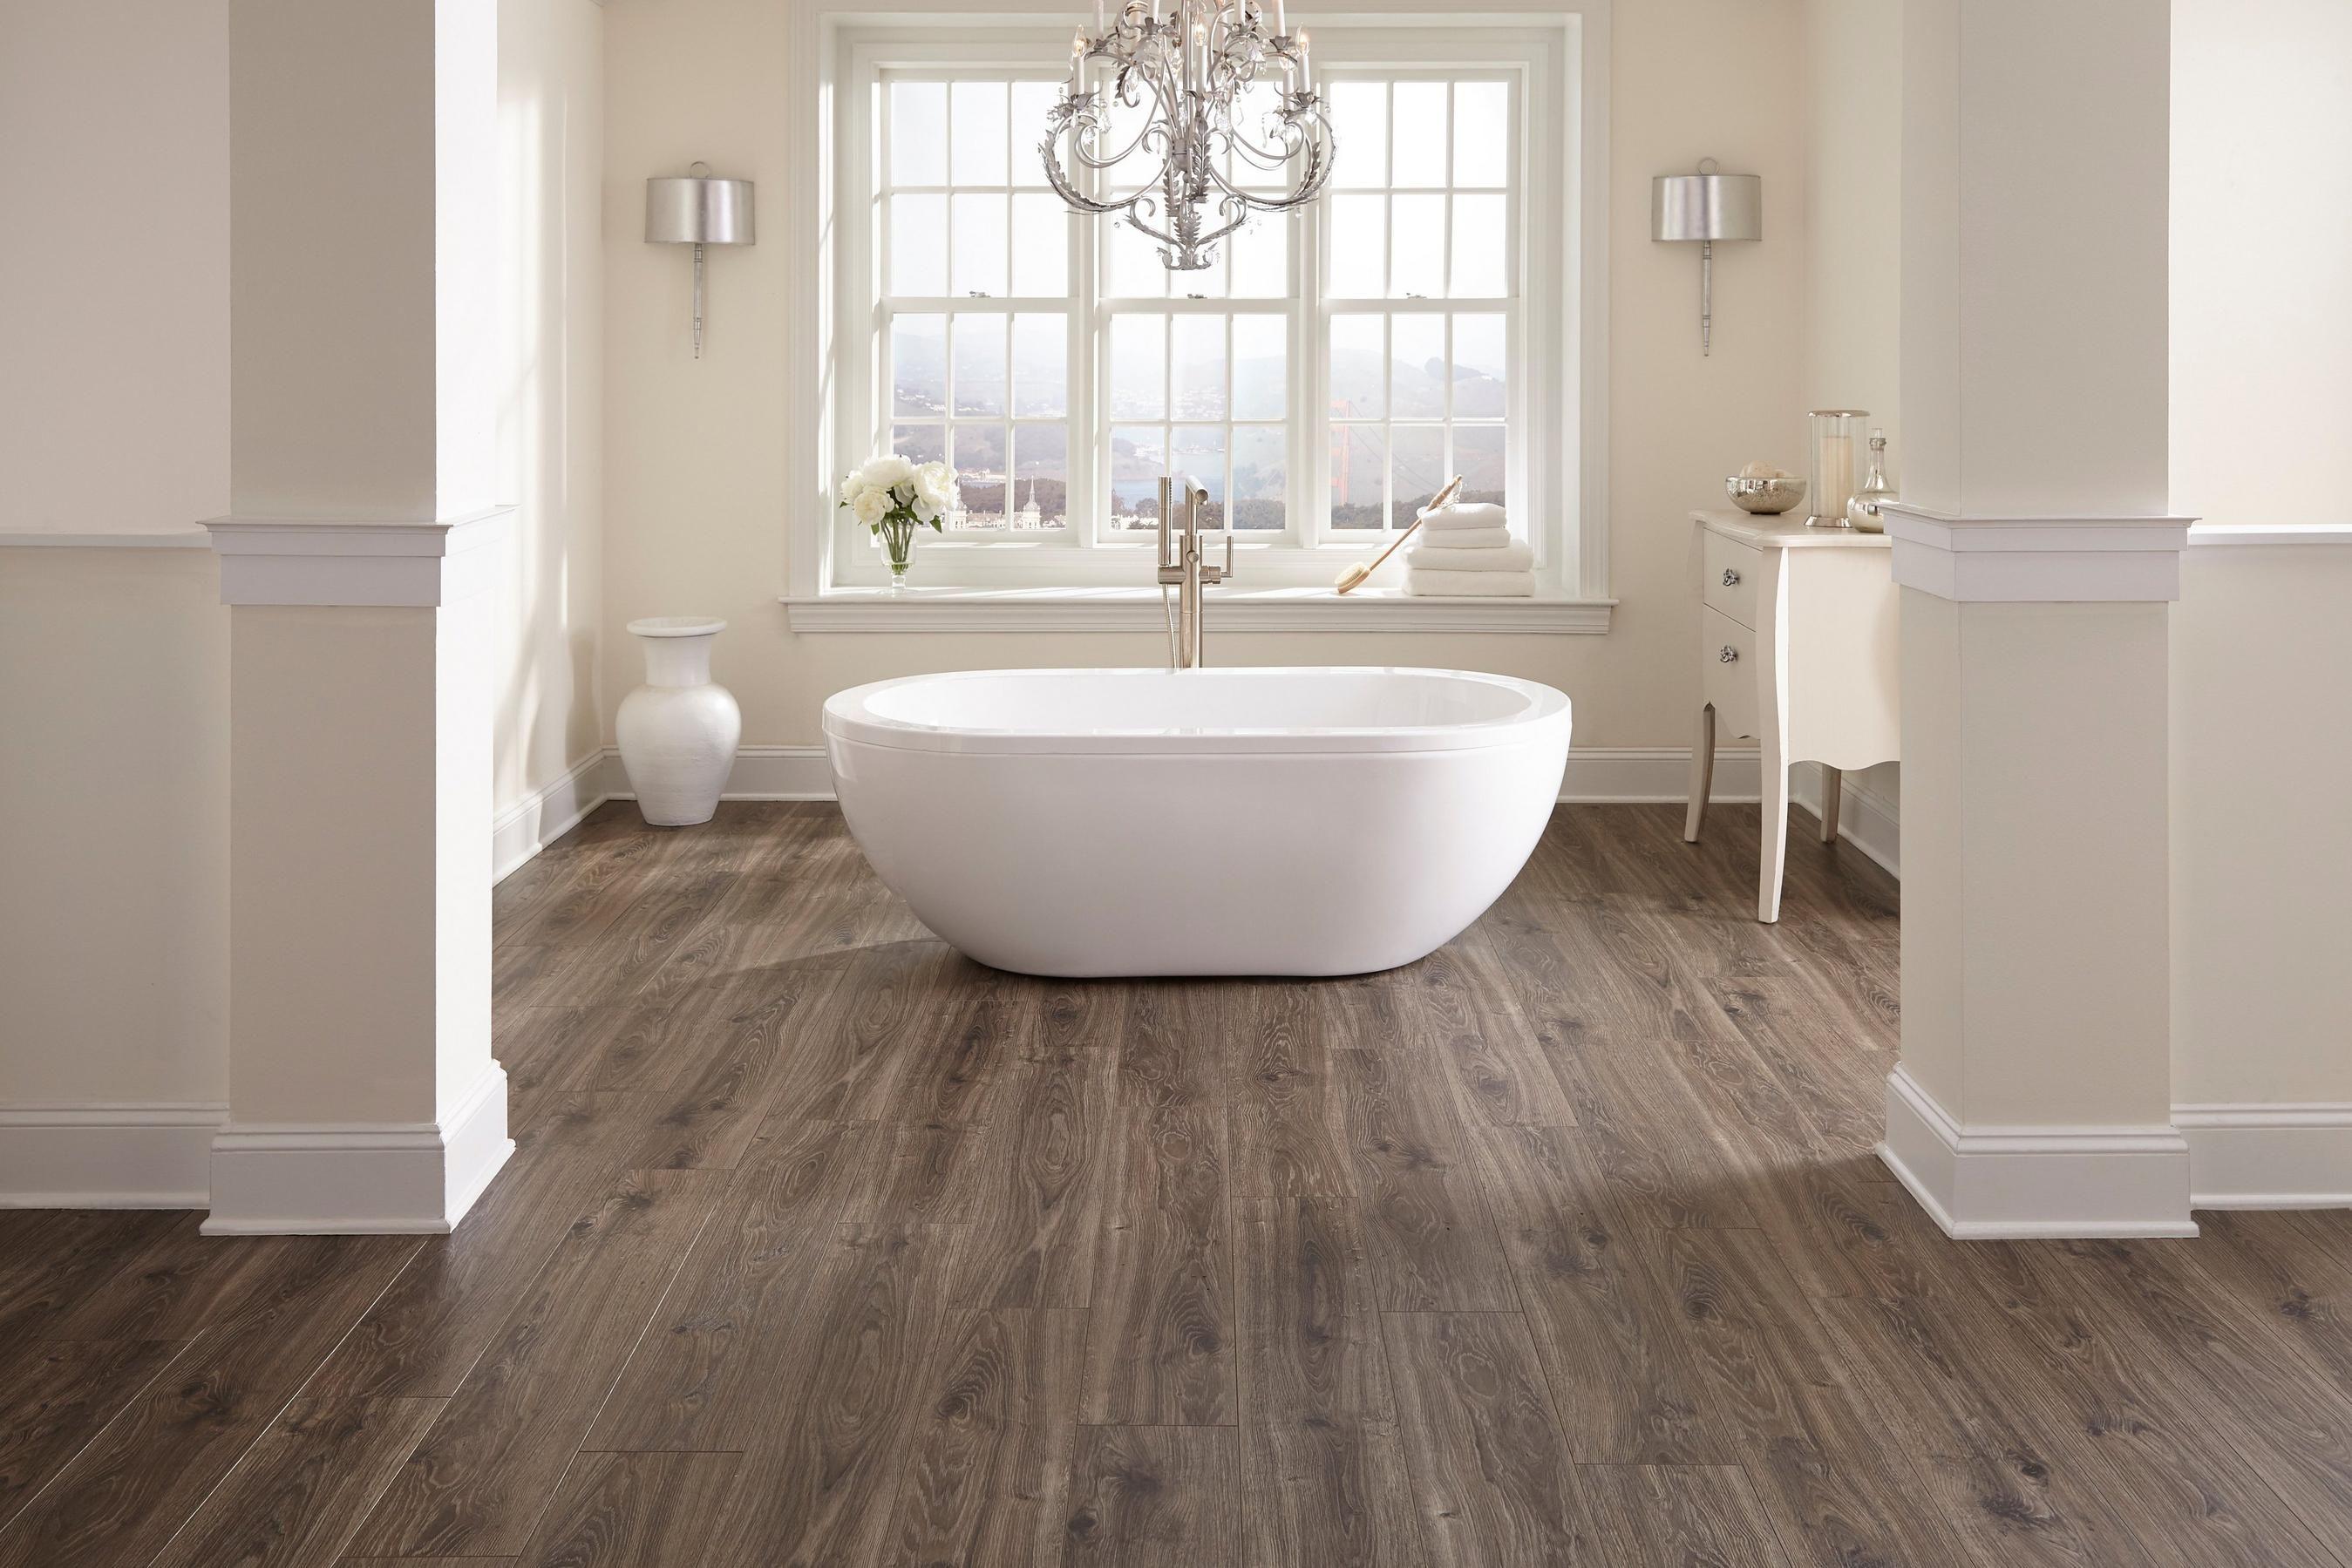 Rooms, Bathroom 33 Aquaguard Smoky Dusk Water Resistant